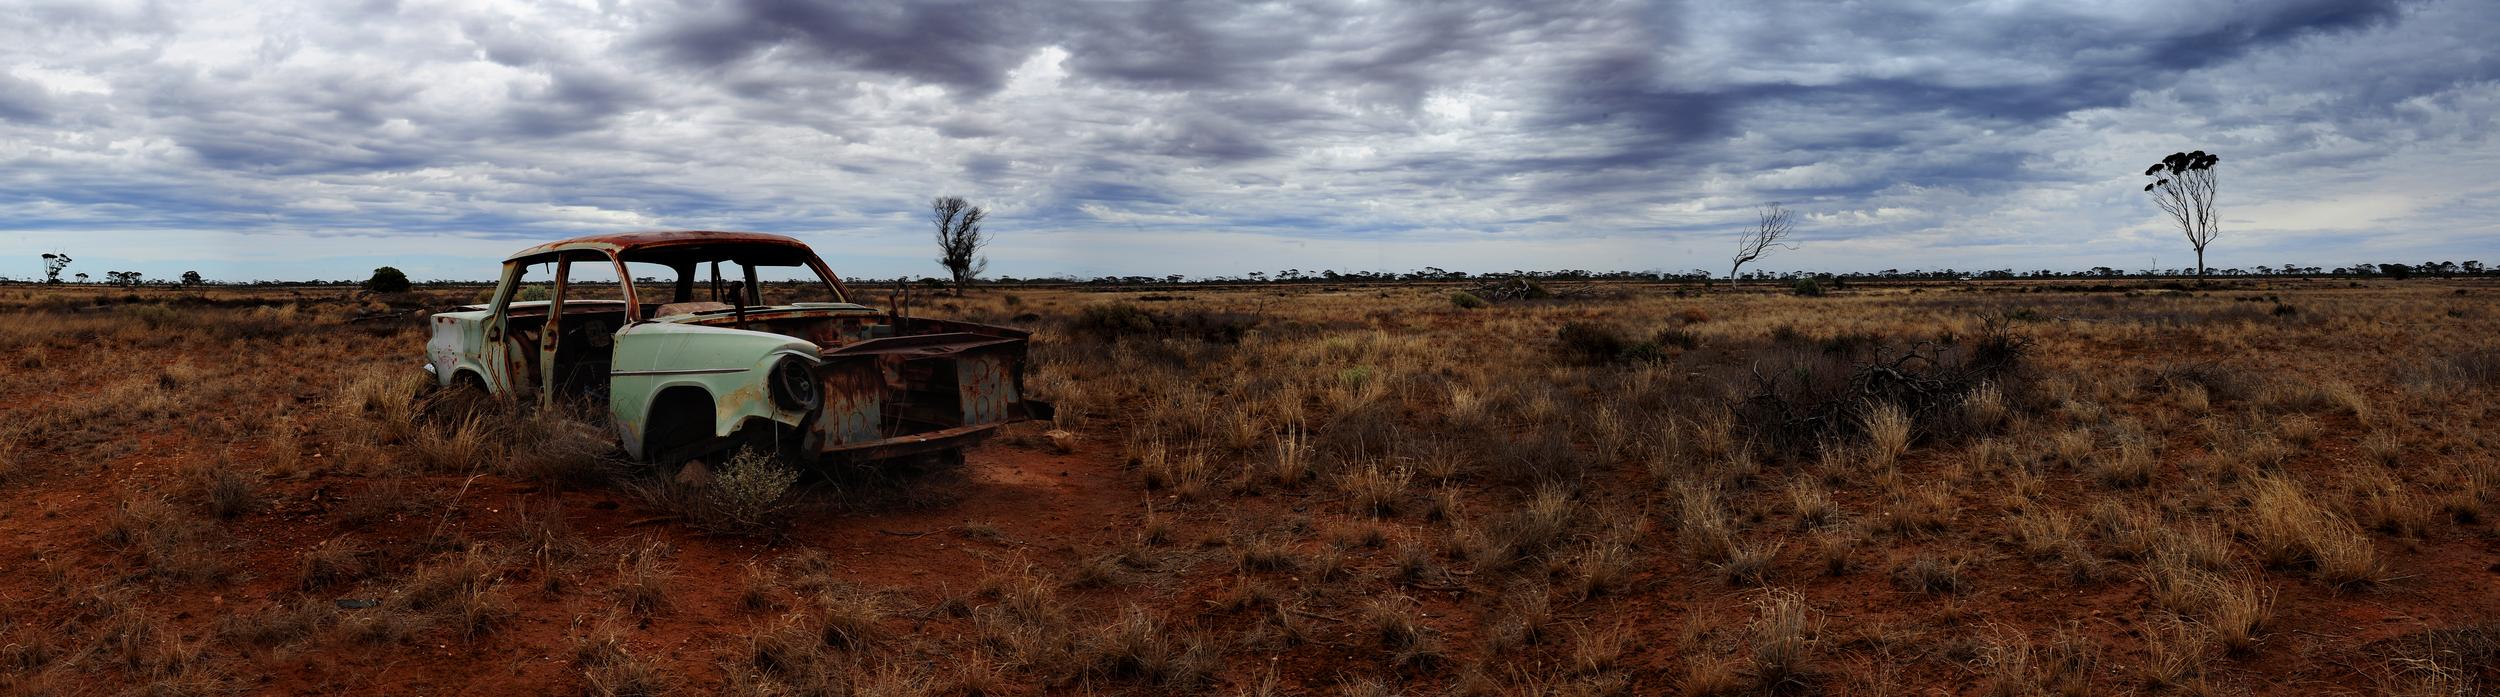 AUTOWRACK - AUSTRALIEN